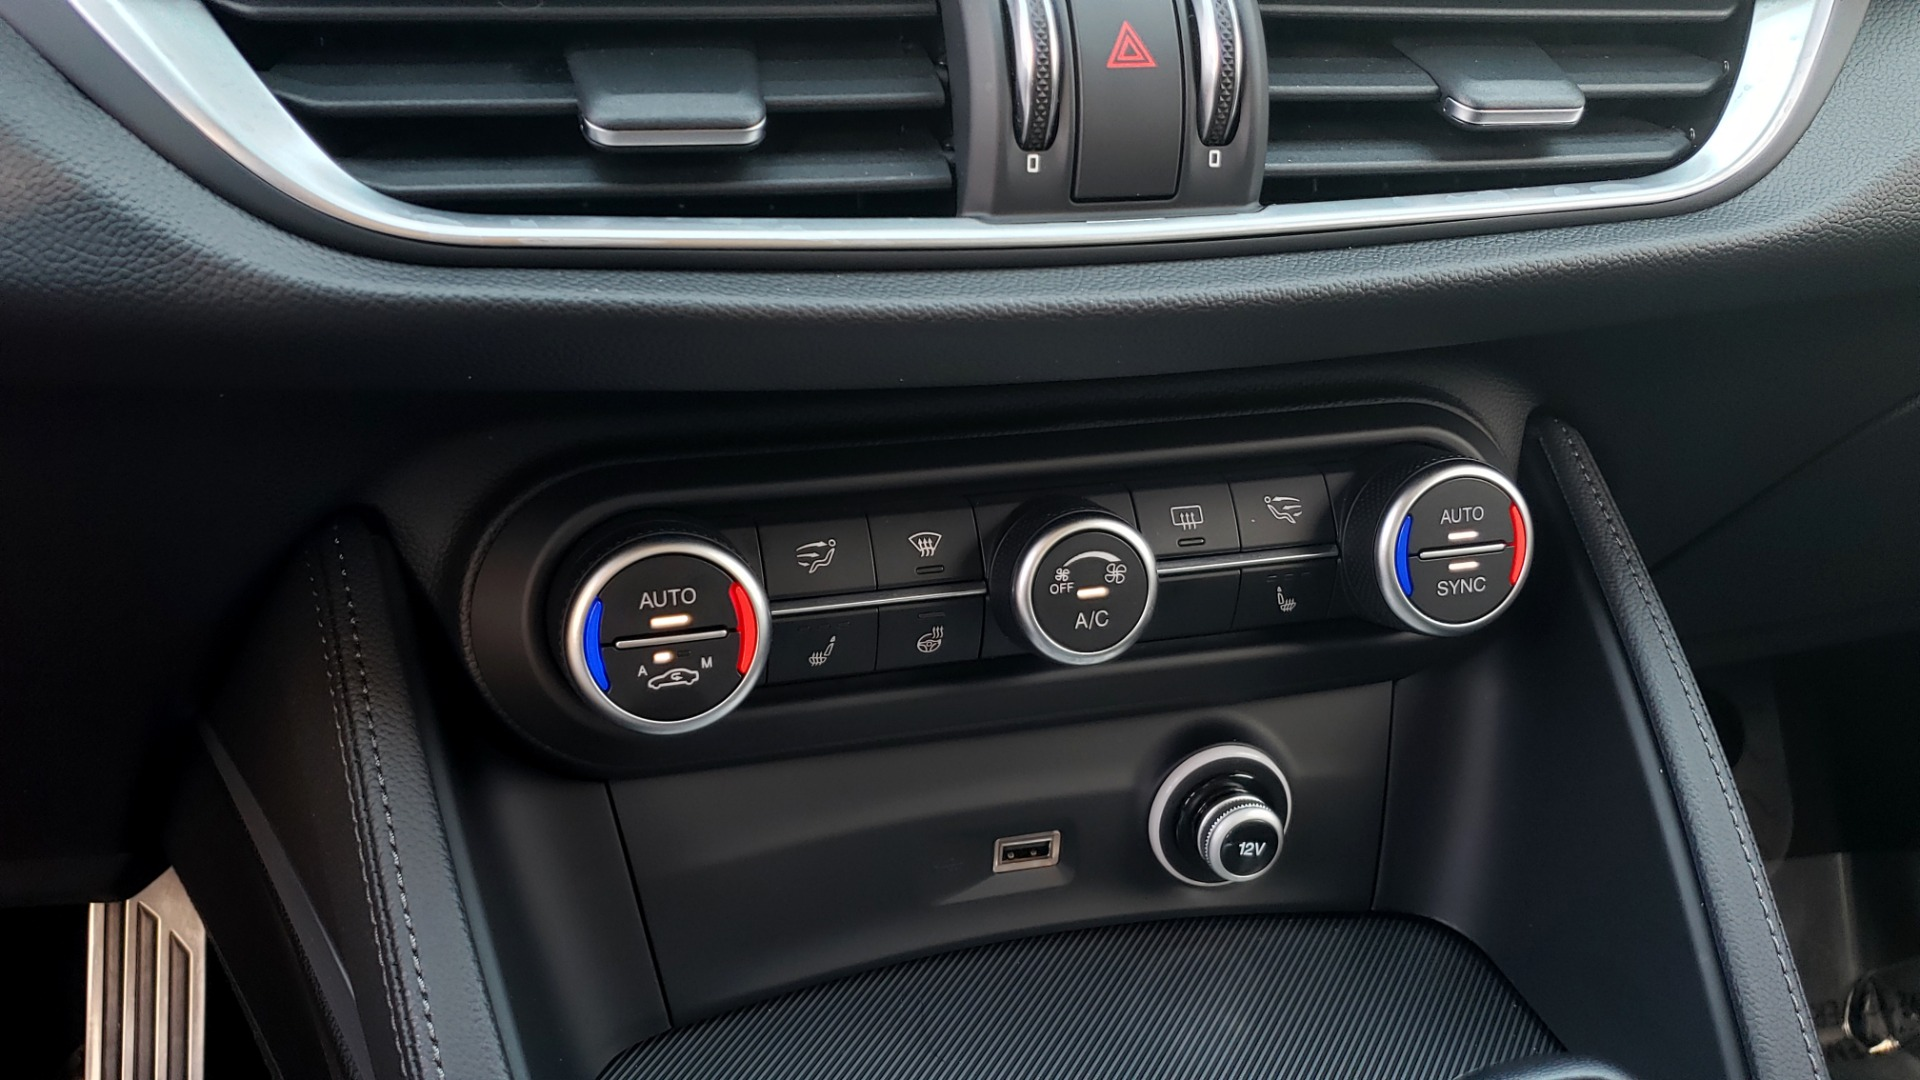 Used 2019 Alfa Romeo STELVIO TI SPORT AWD / 2.0L TURBO / 8-SPD AUTO / DRVR ASST / REARVIEW for sale $37,495 at Formula Imports in Charlotte NC 28227 54